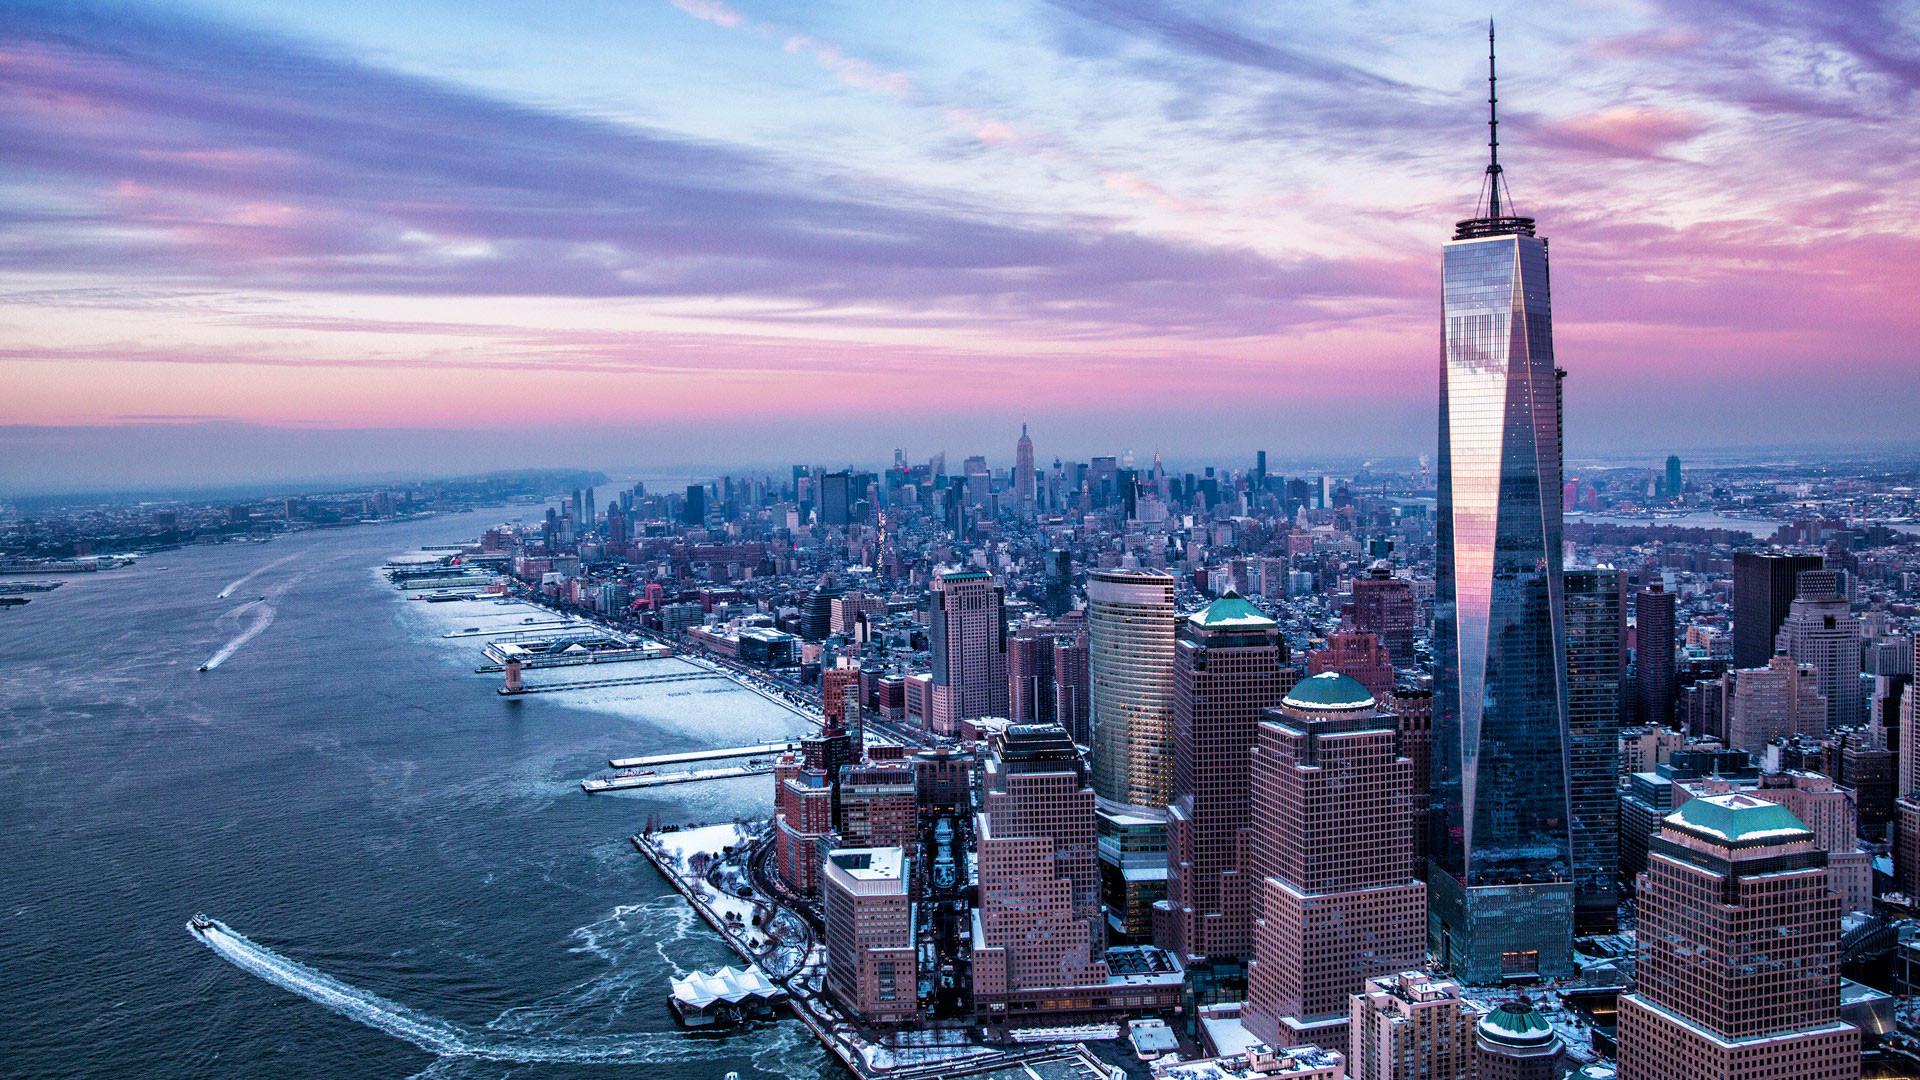 hd pics photos city winter in new york desktop background wallpaper